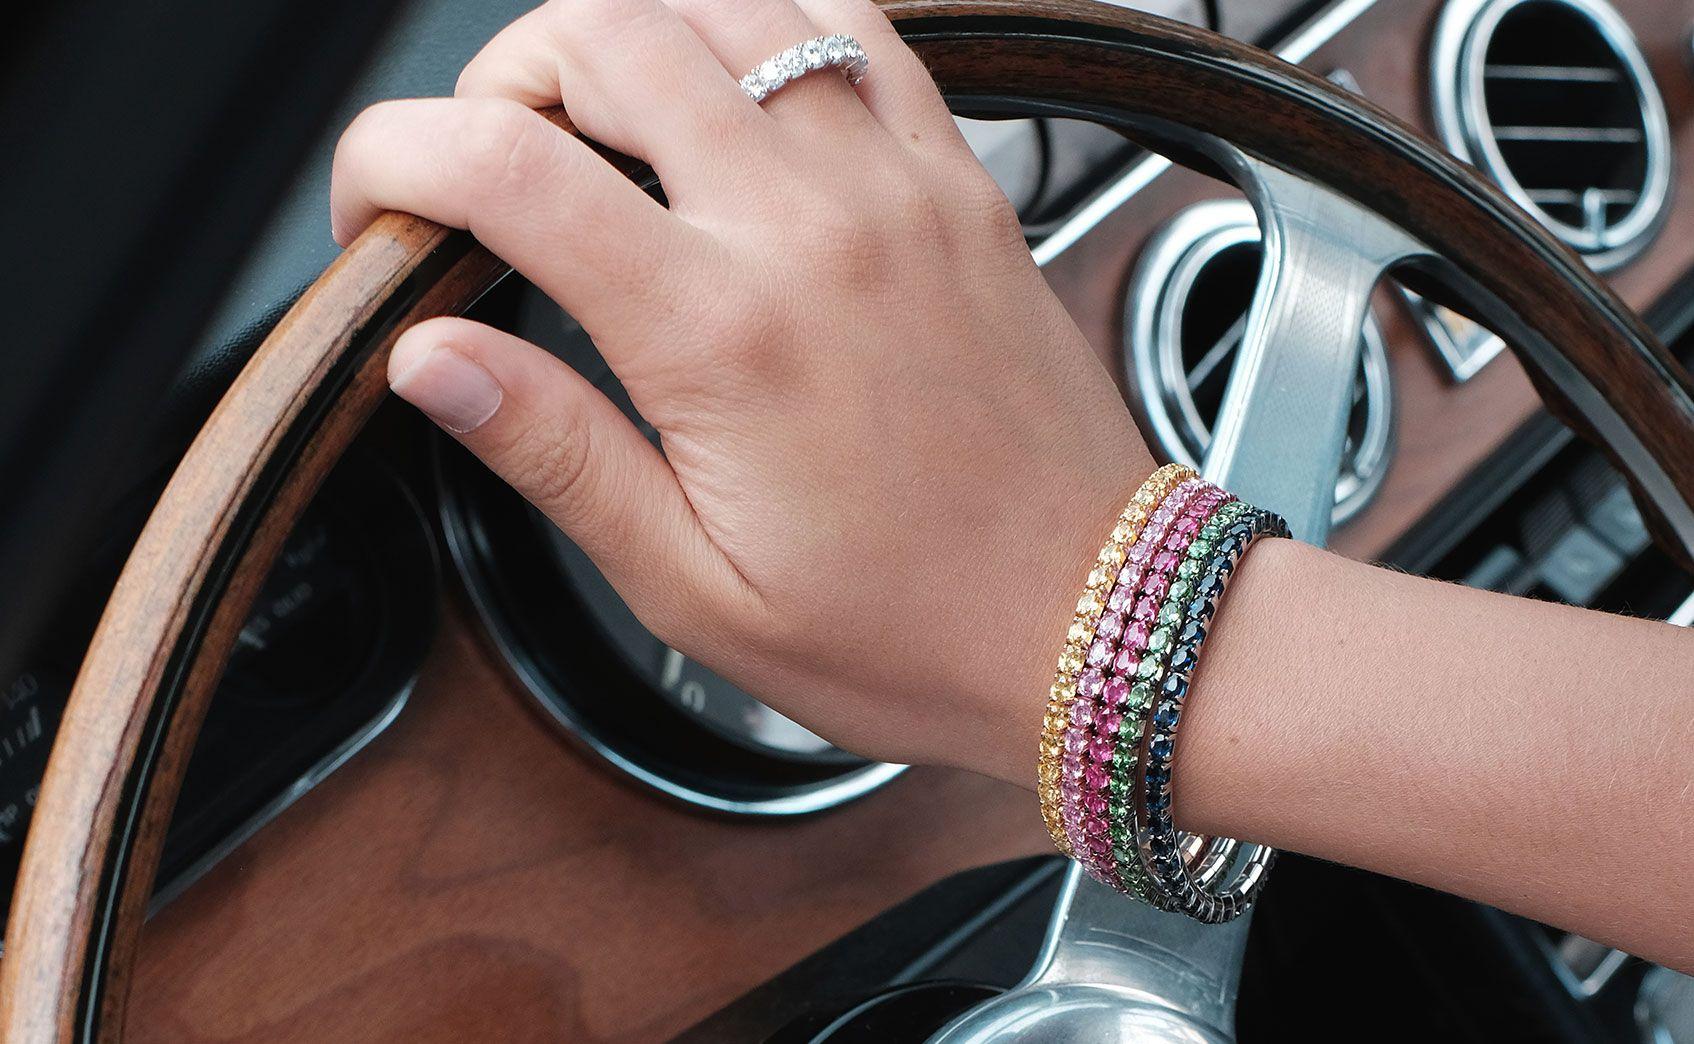 extensible special elastic tennis bracelet